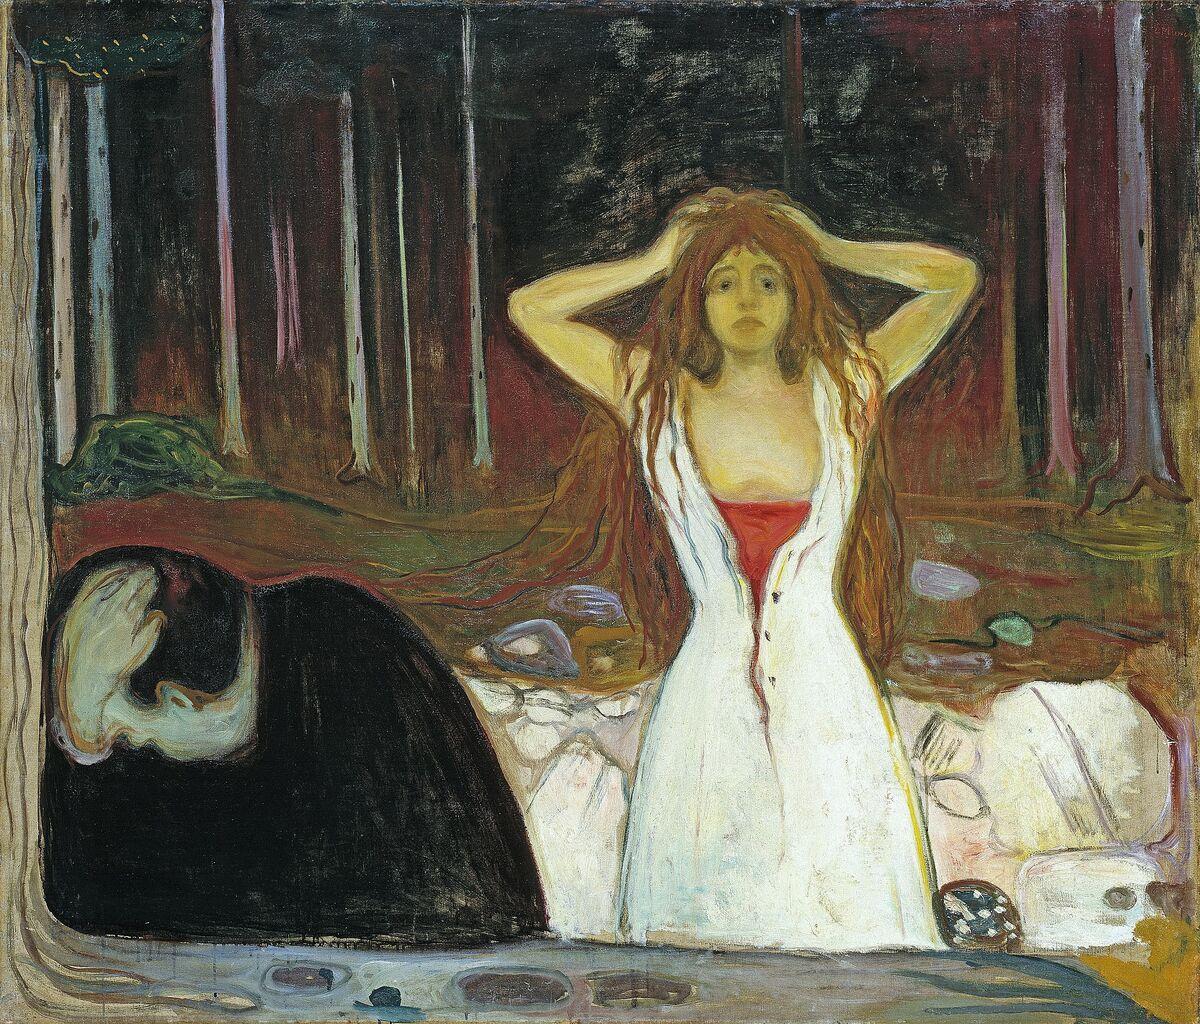 Edvard Munch, Ashes, 1895. Imagen a través de Wikimedia Commons.